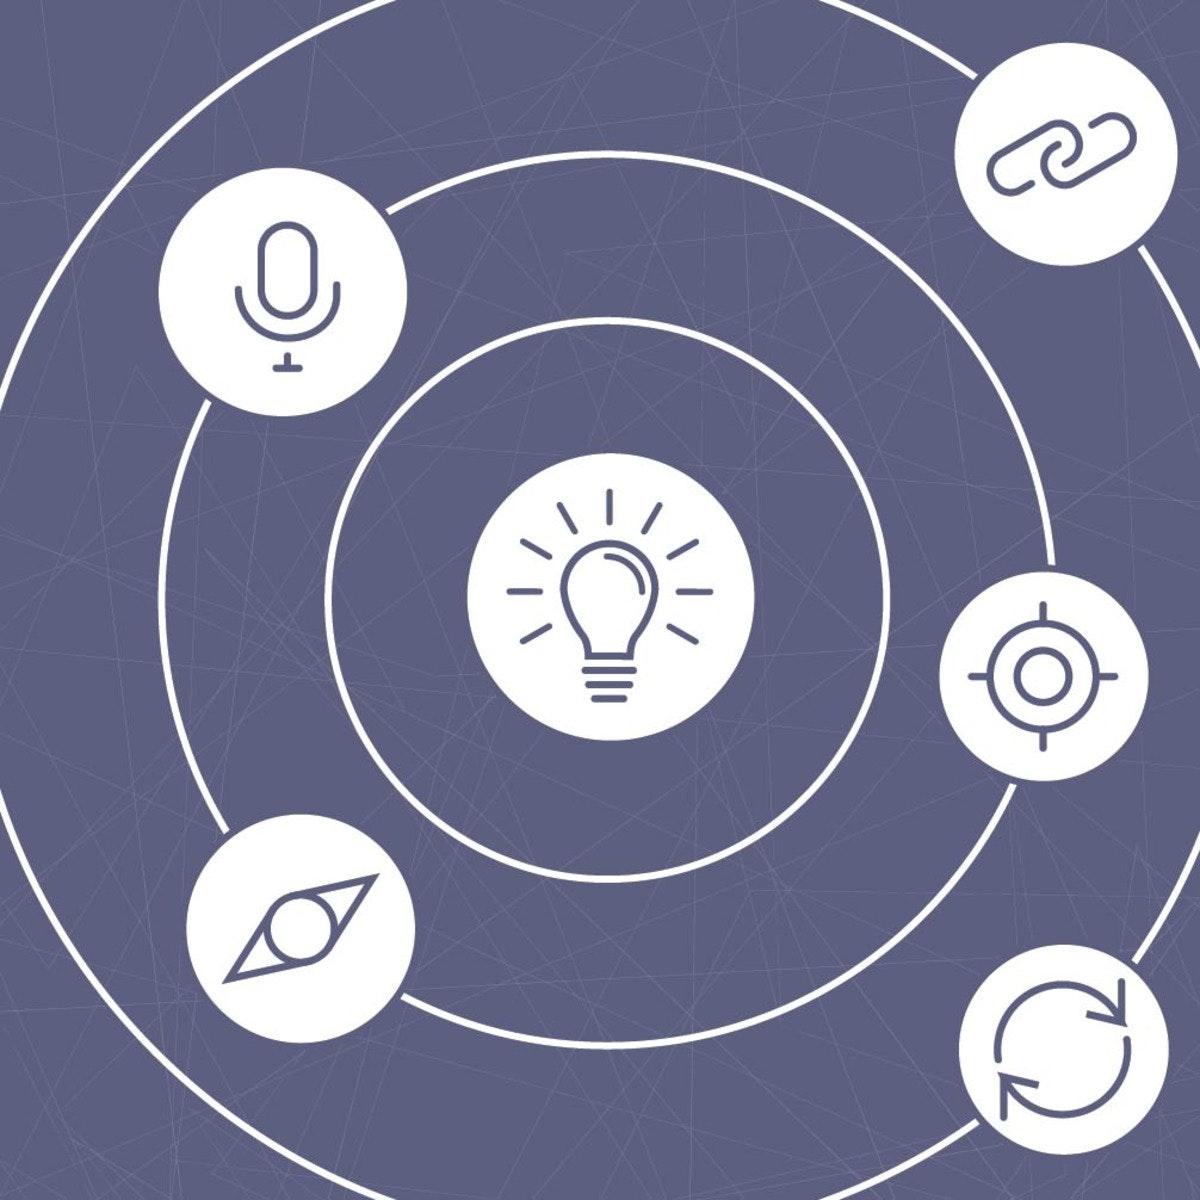 Unleashing the Impact of your Social Enterprise